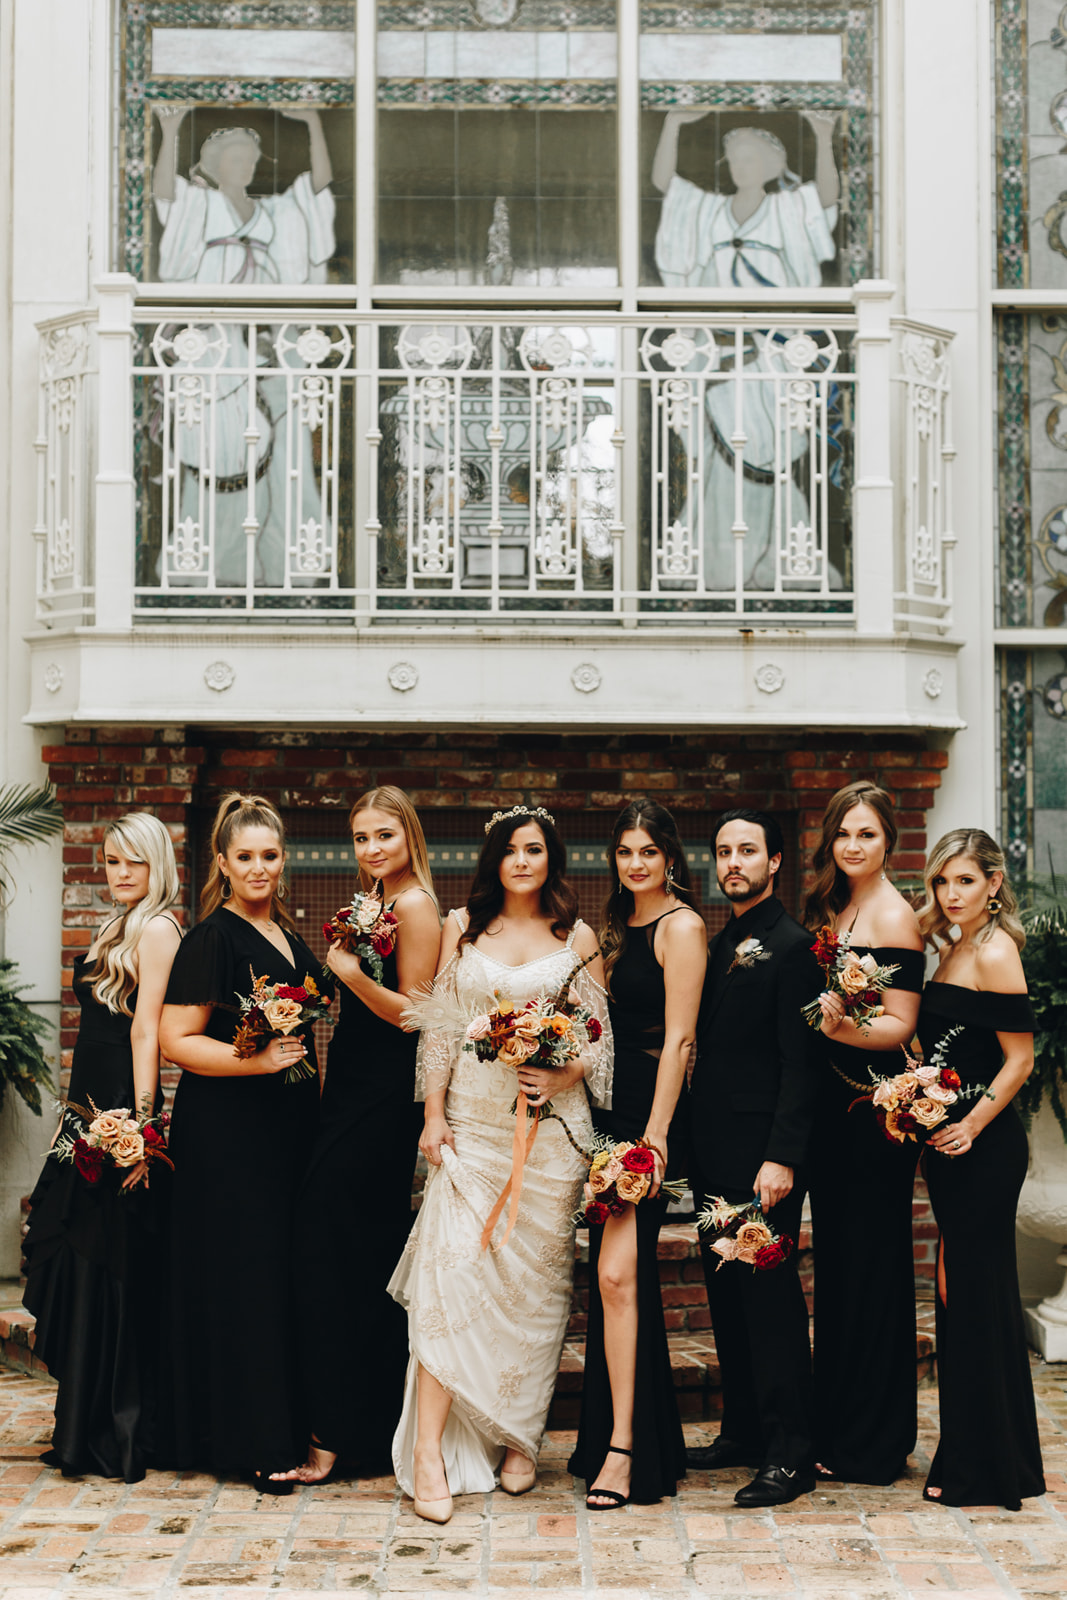 black bridesmaids dresses at downtown orlando wedding